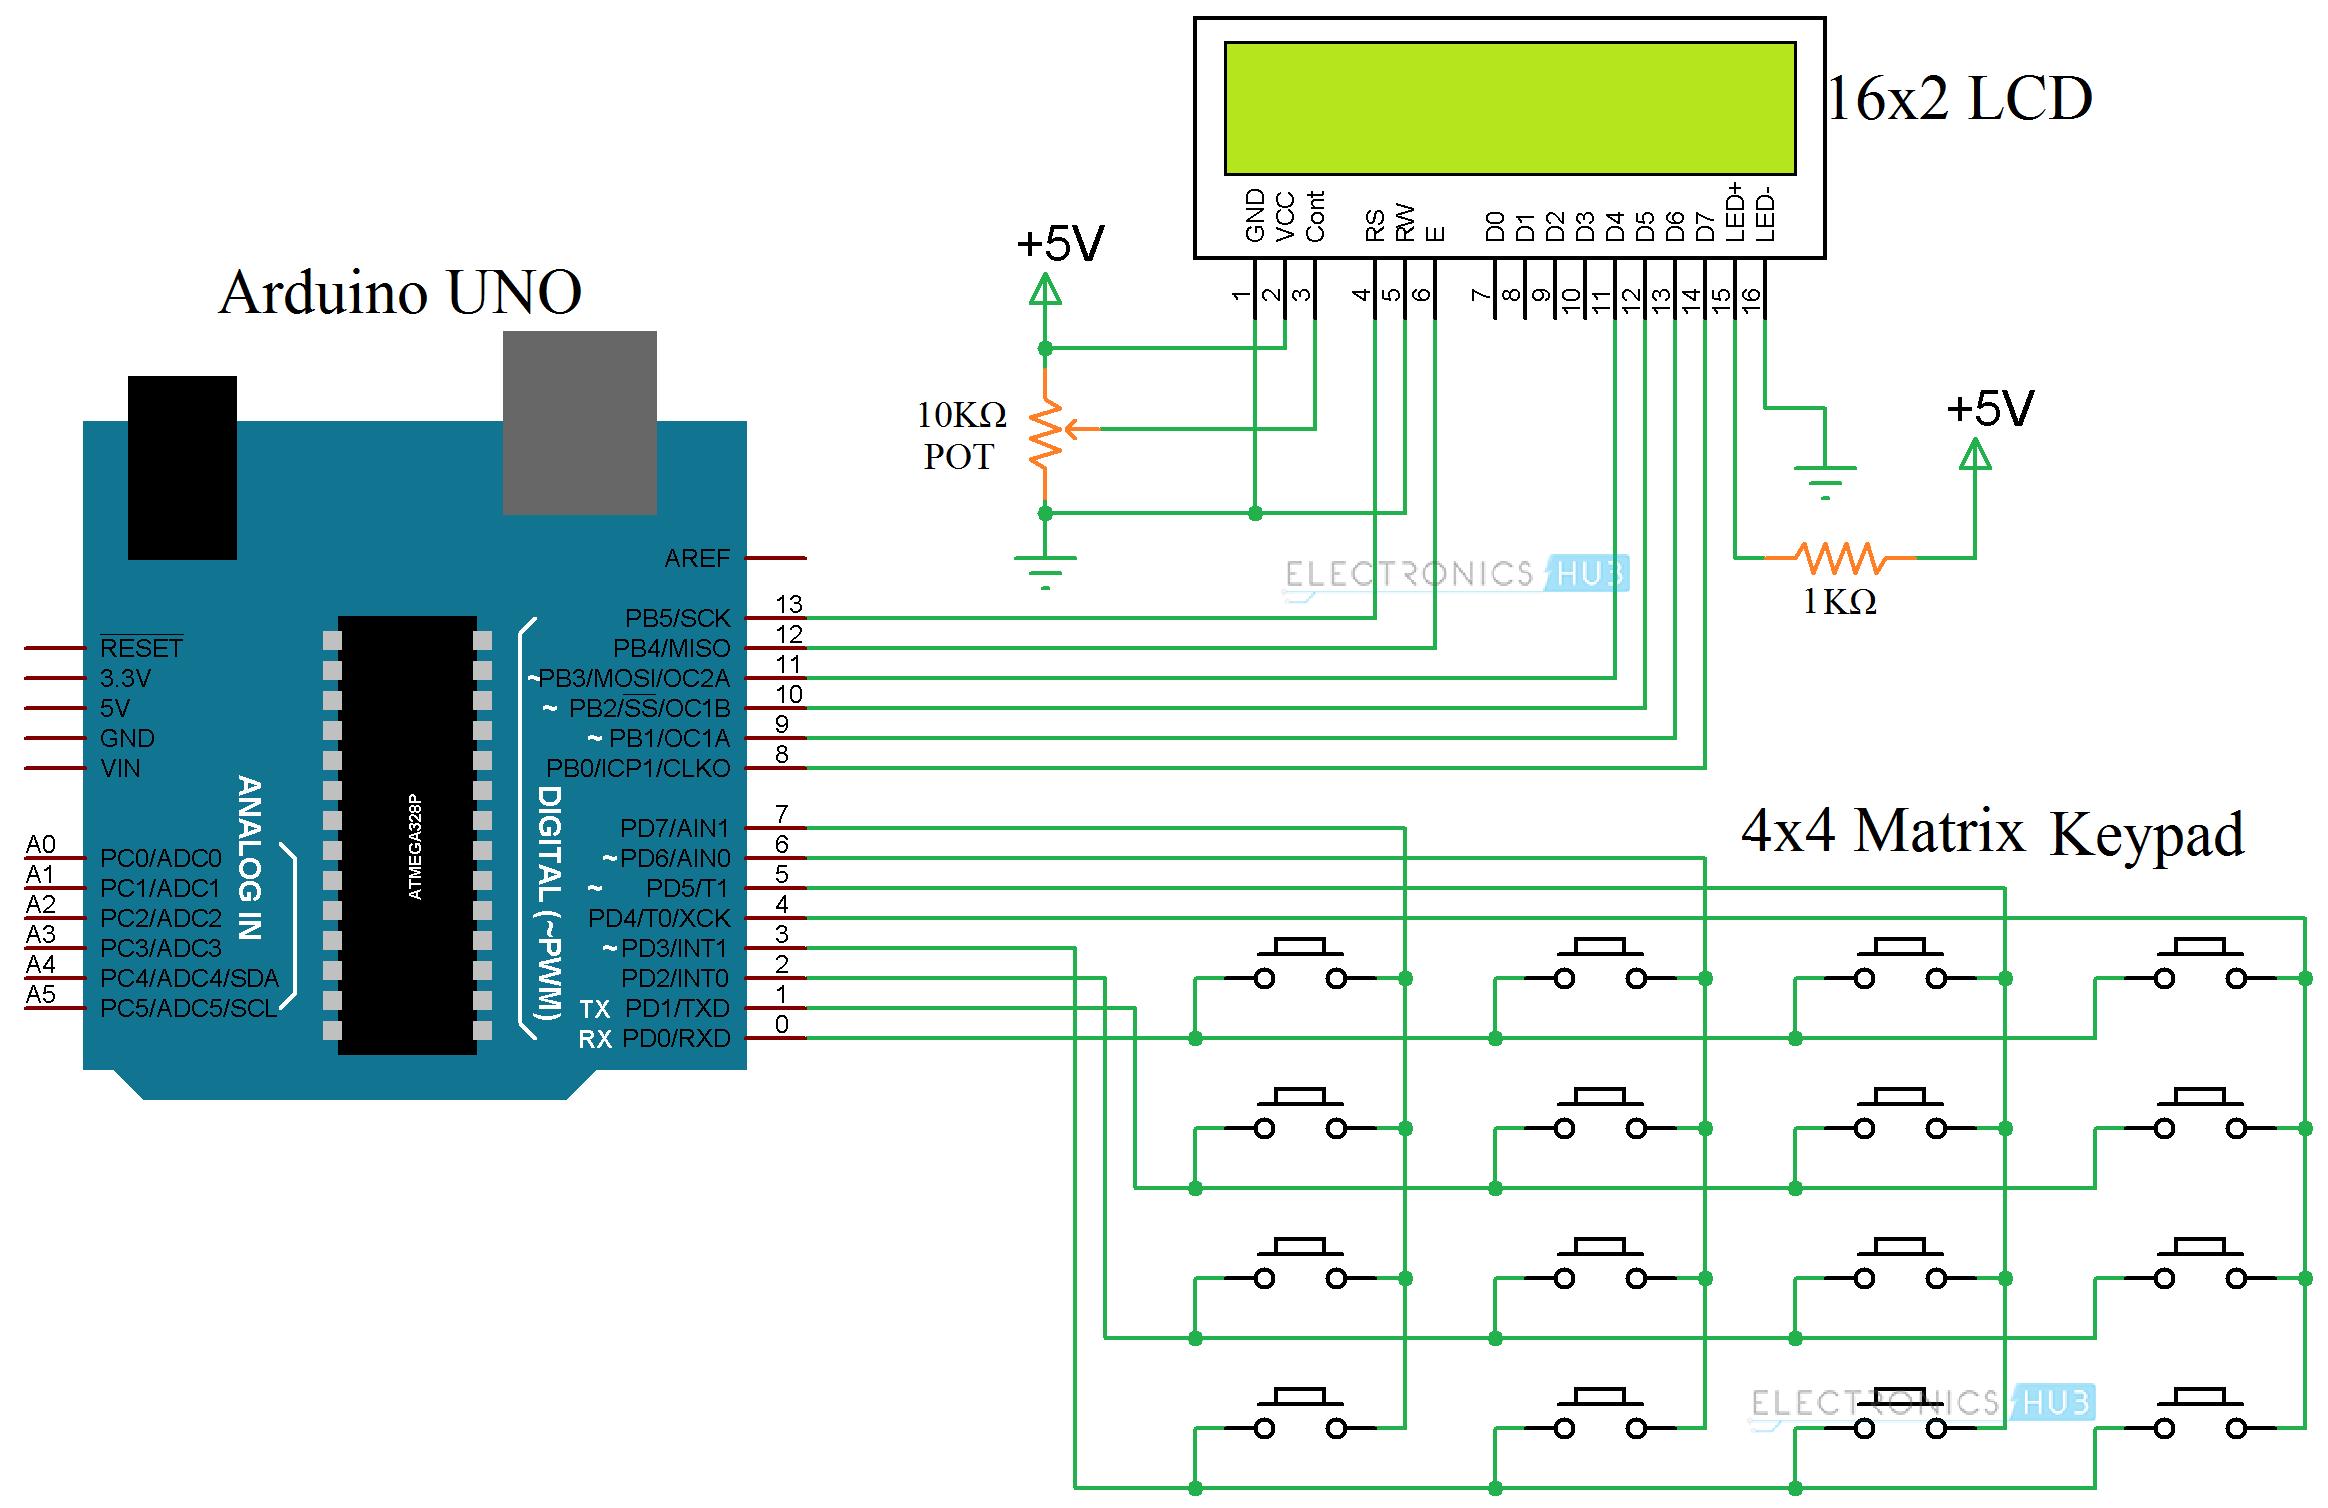 [QMVU_8575]  YS_5397] Keyboard Matrix Wiring Diagram Free Diagram | Membrane 1x4 Keypad Wiring Diagram |  | Inrebe Epete Exmet Mohammedshrine Librar Wiring 101